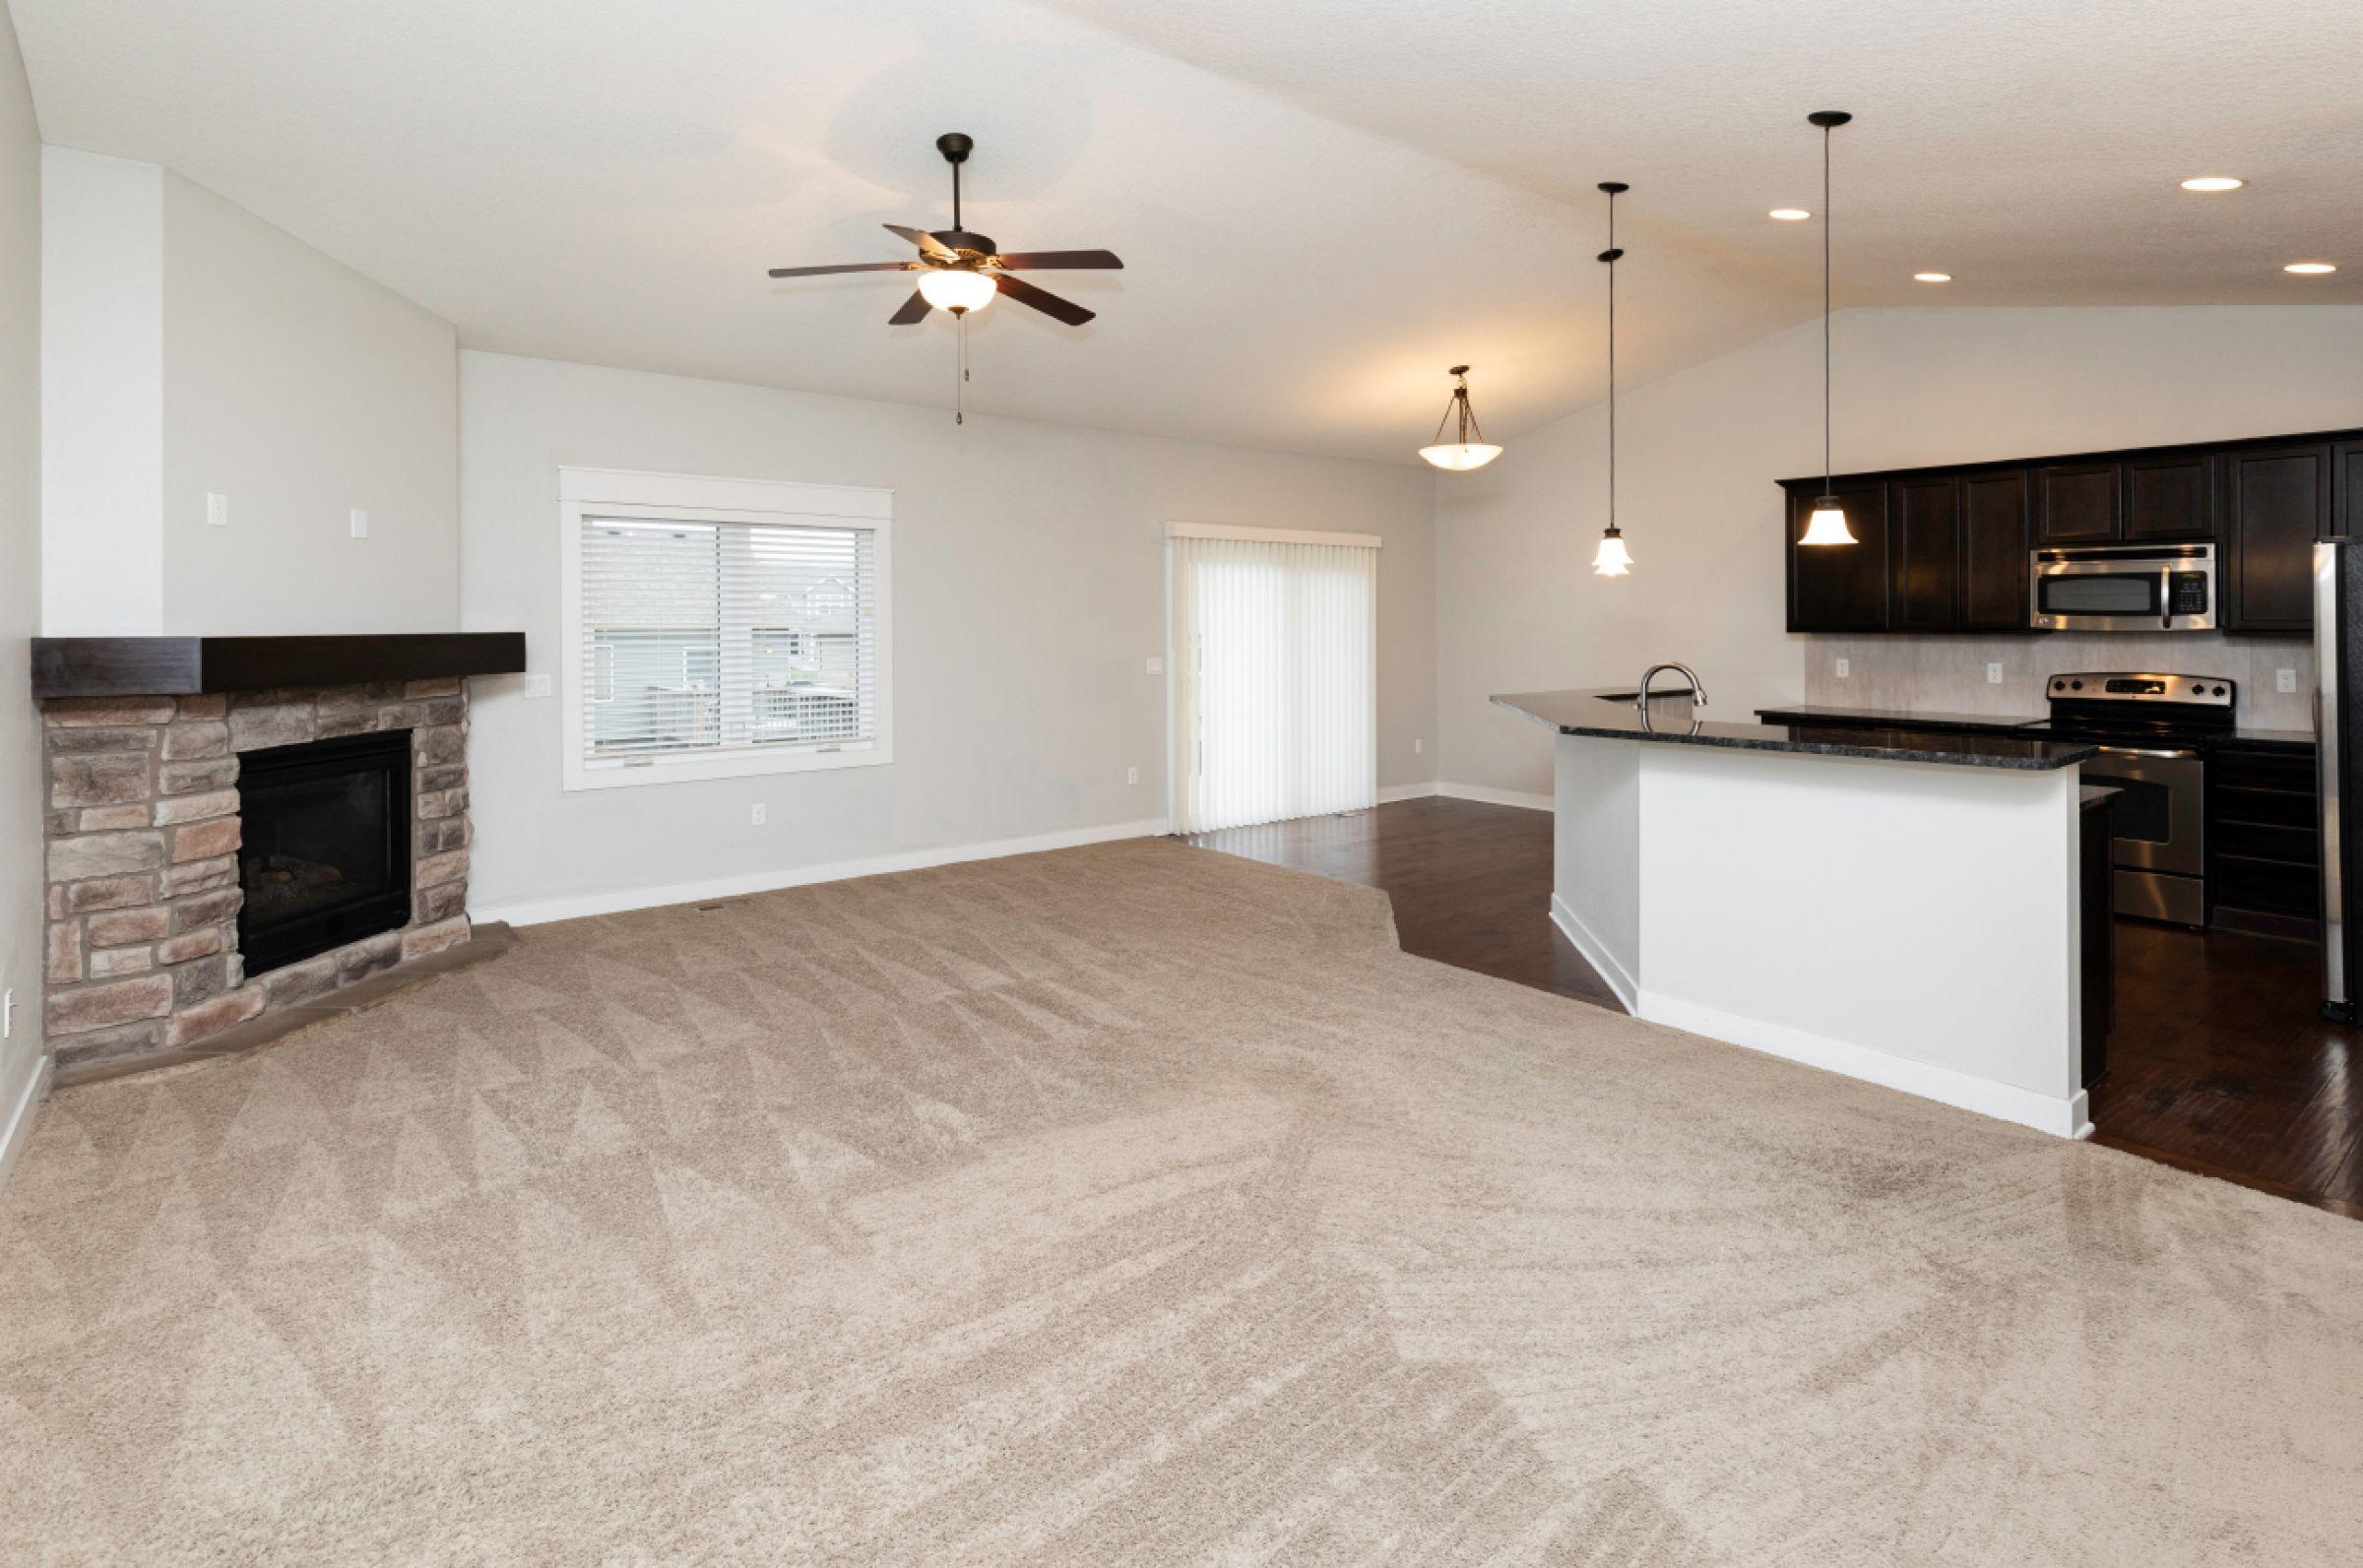 residential-polk-county-iowa-0-acres-listing-number-15273-1-2020-12-07-221507.jpg